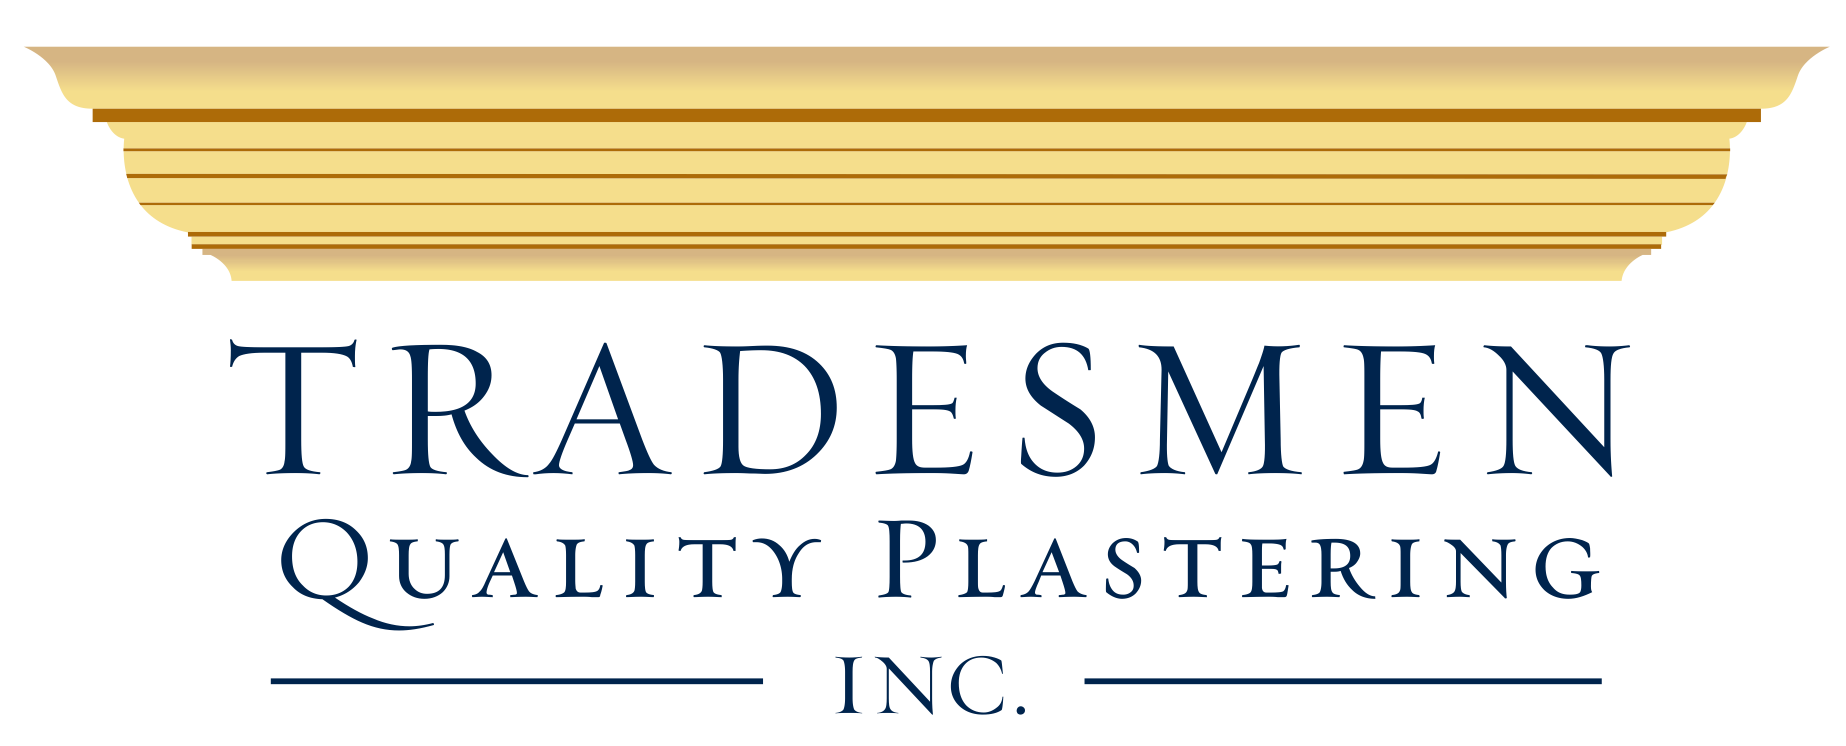 Tradesmen Quality Plastering